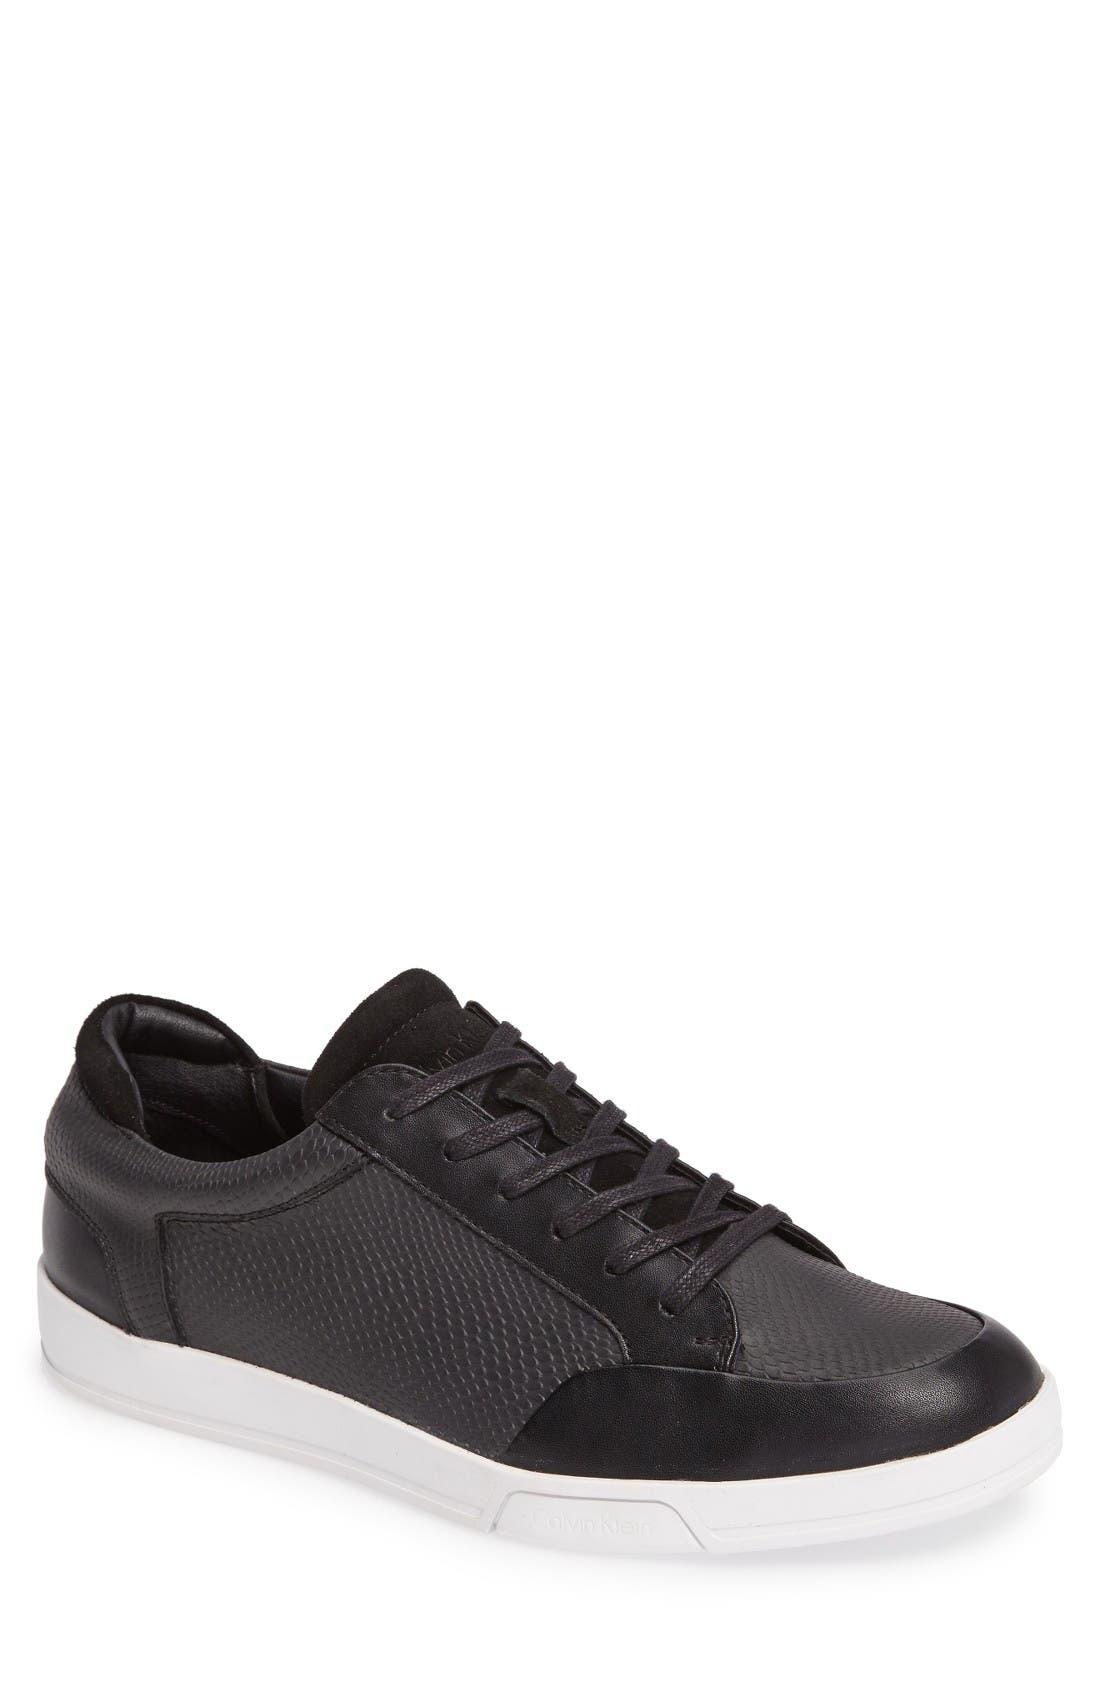 Main Image - Calvin Klein Balin Sneaker (Men)